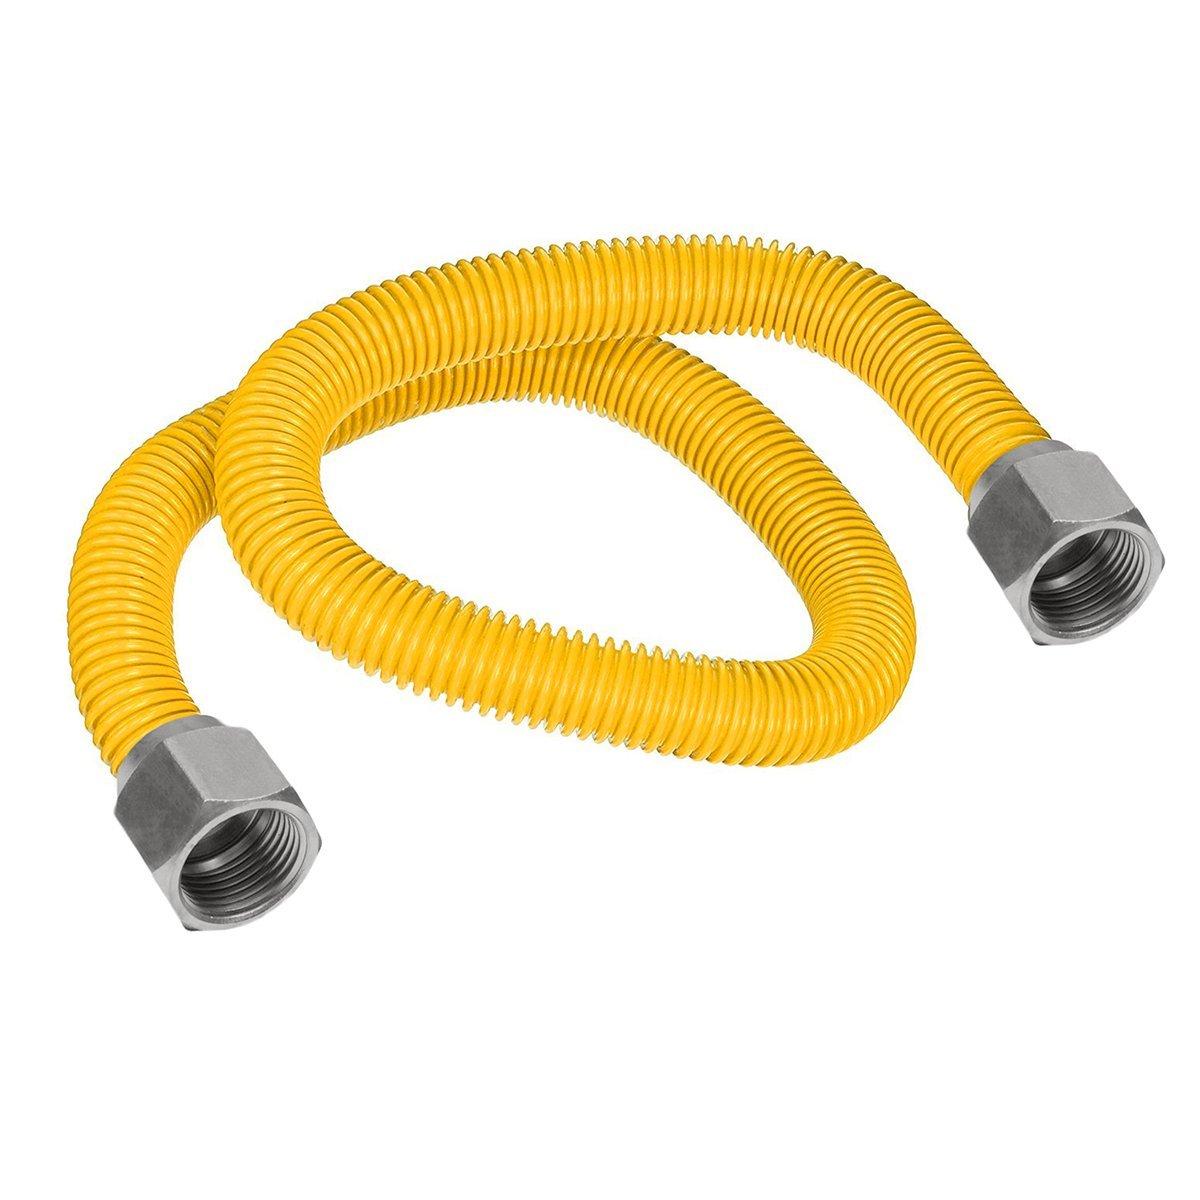 Gas line connectors adventure kings dash cam